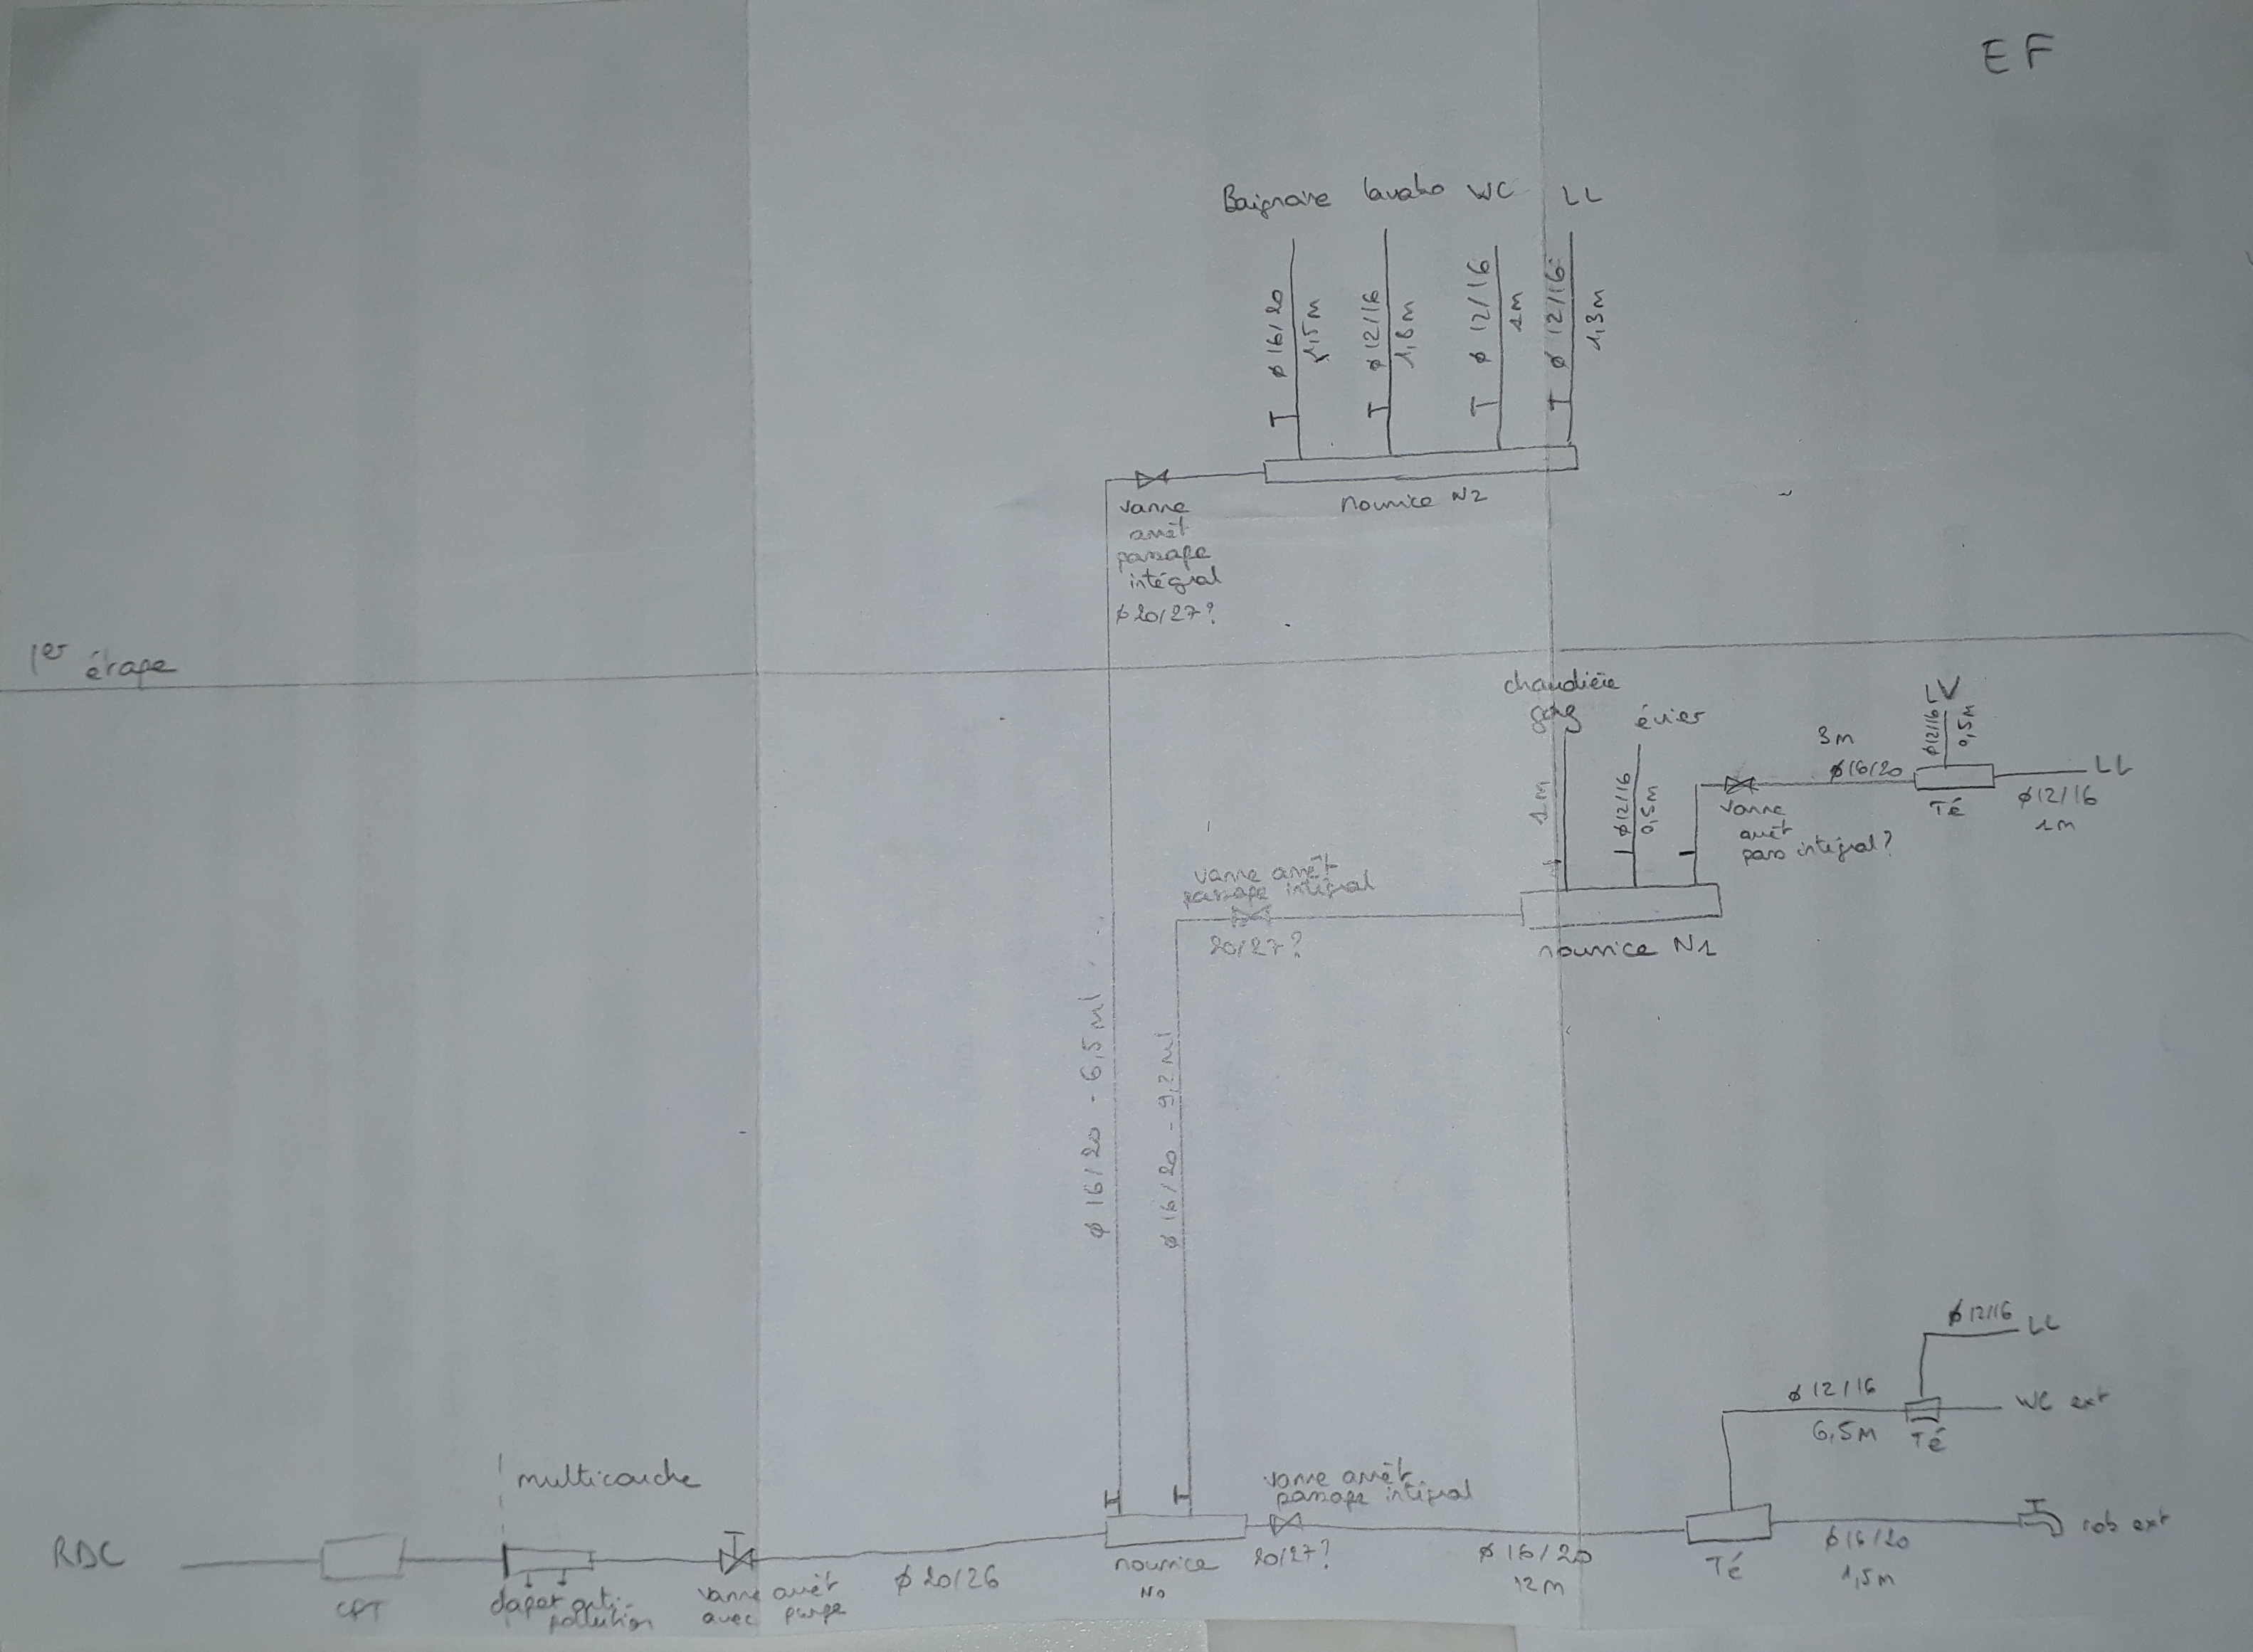 schéma EF.jpg, 2.62 mb, 3166 x 2322